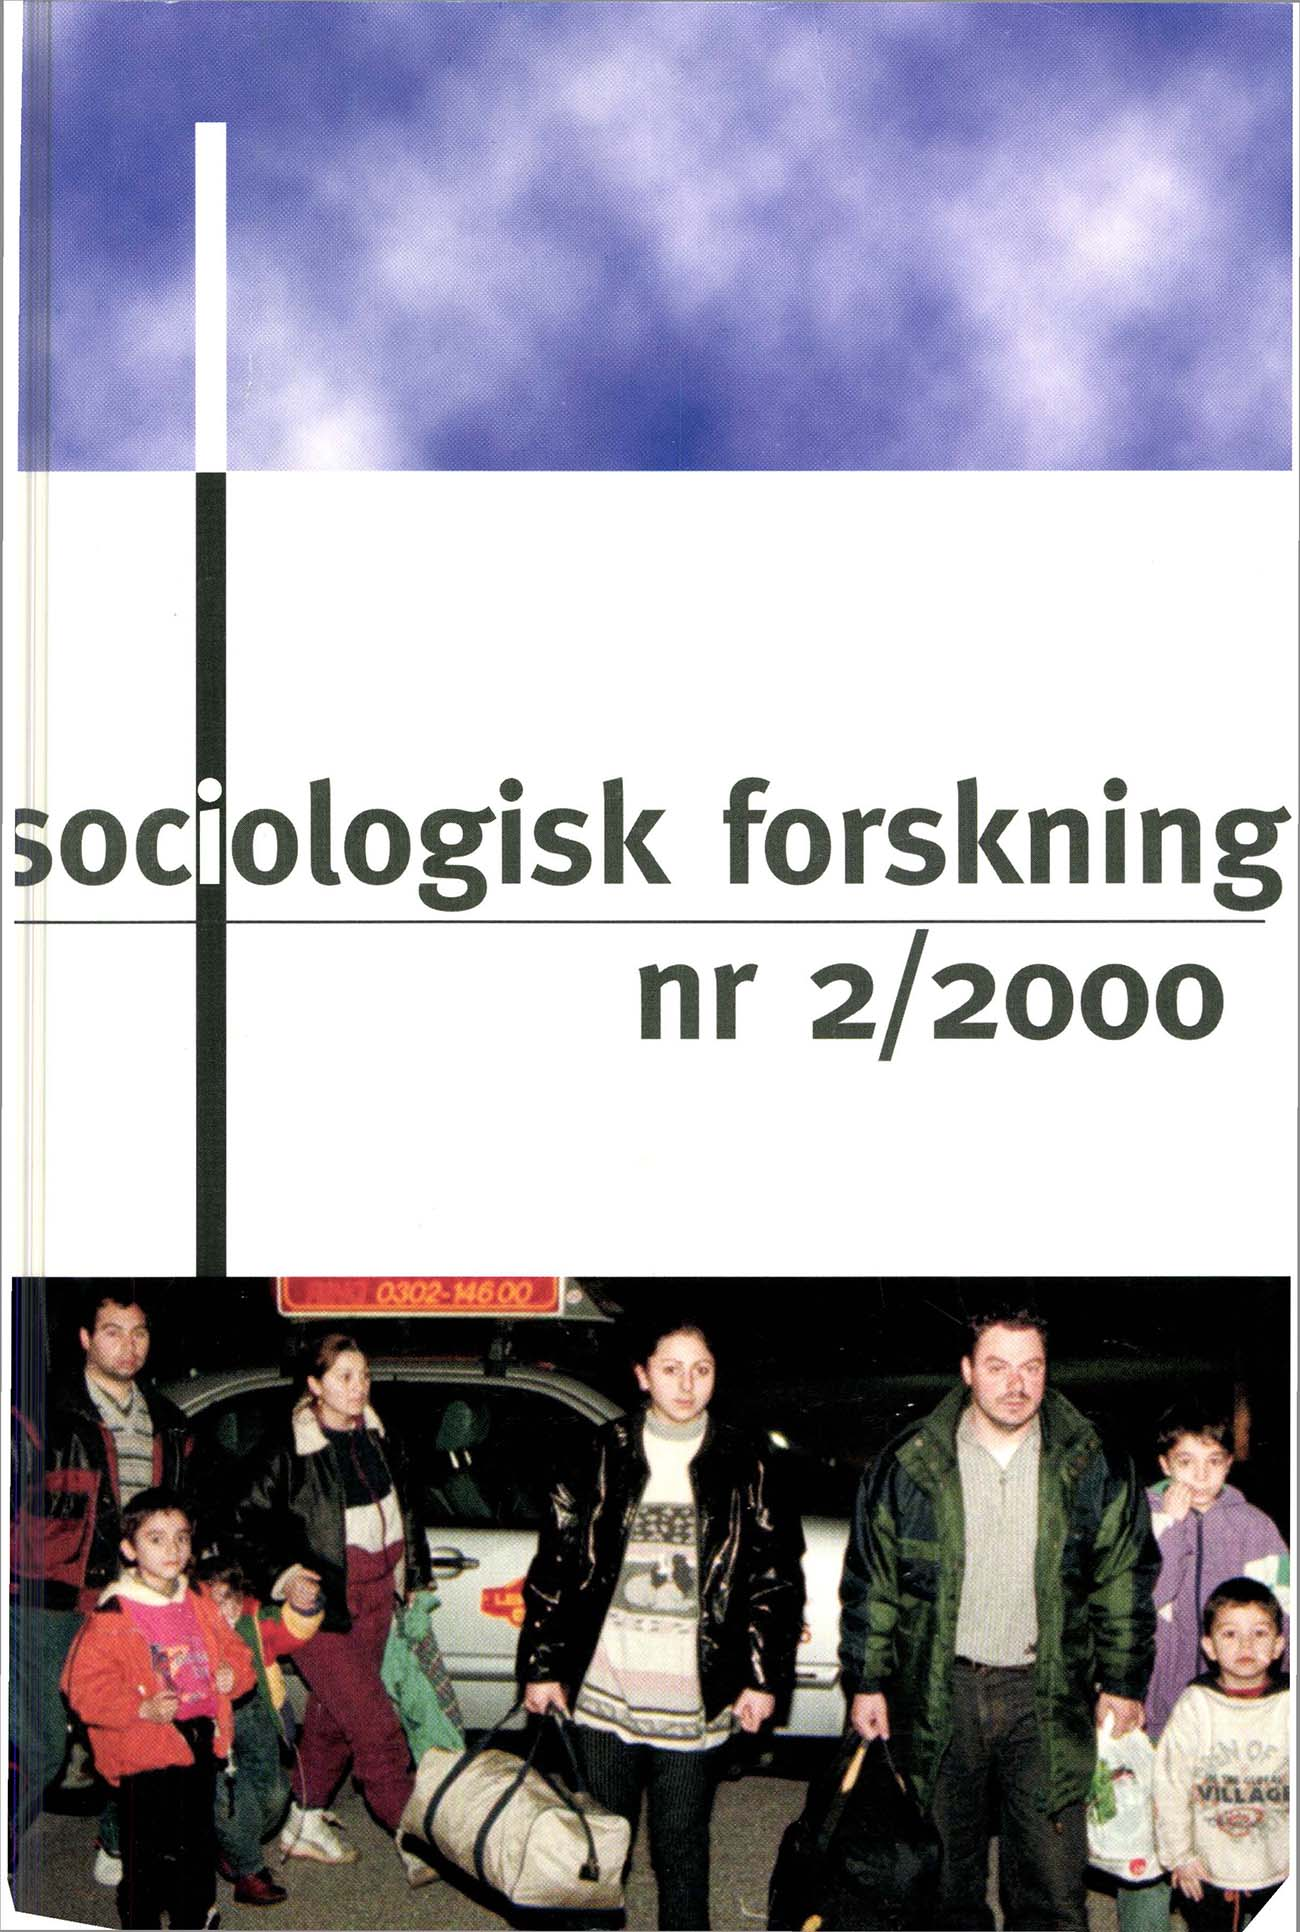 Visa Vol 37 Nr 2 (2000)